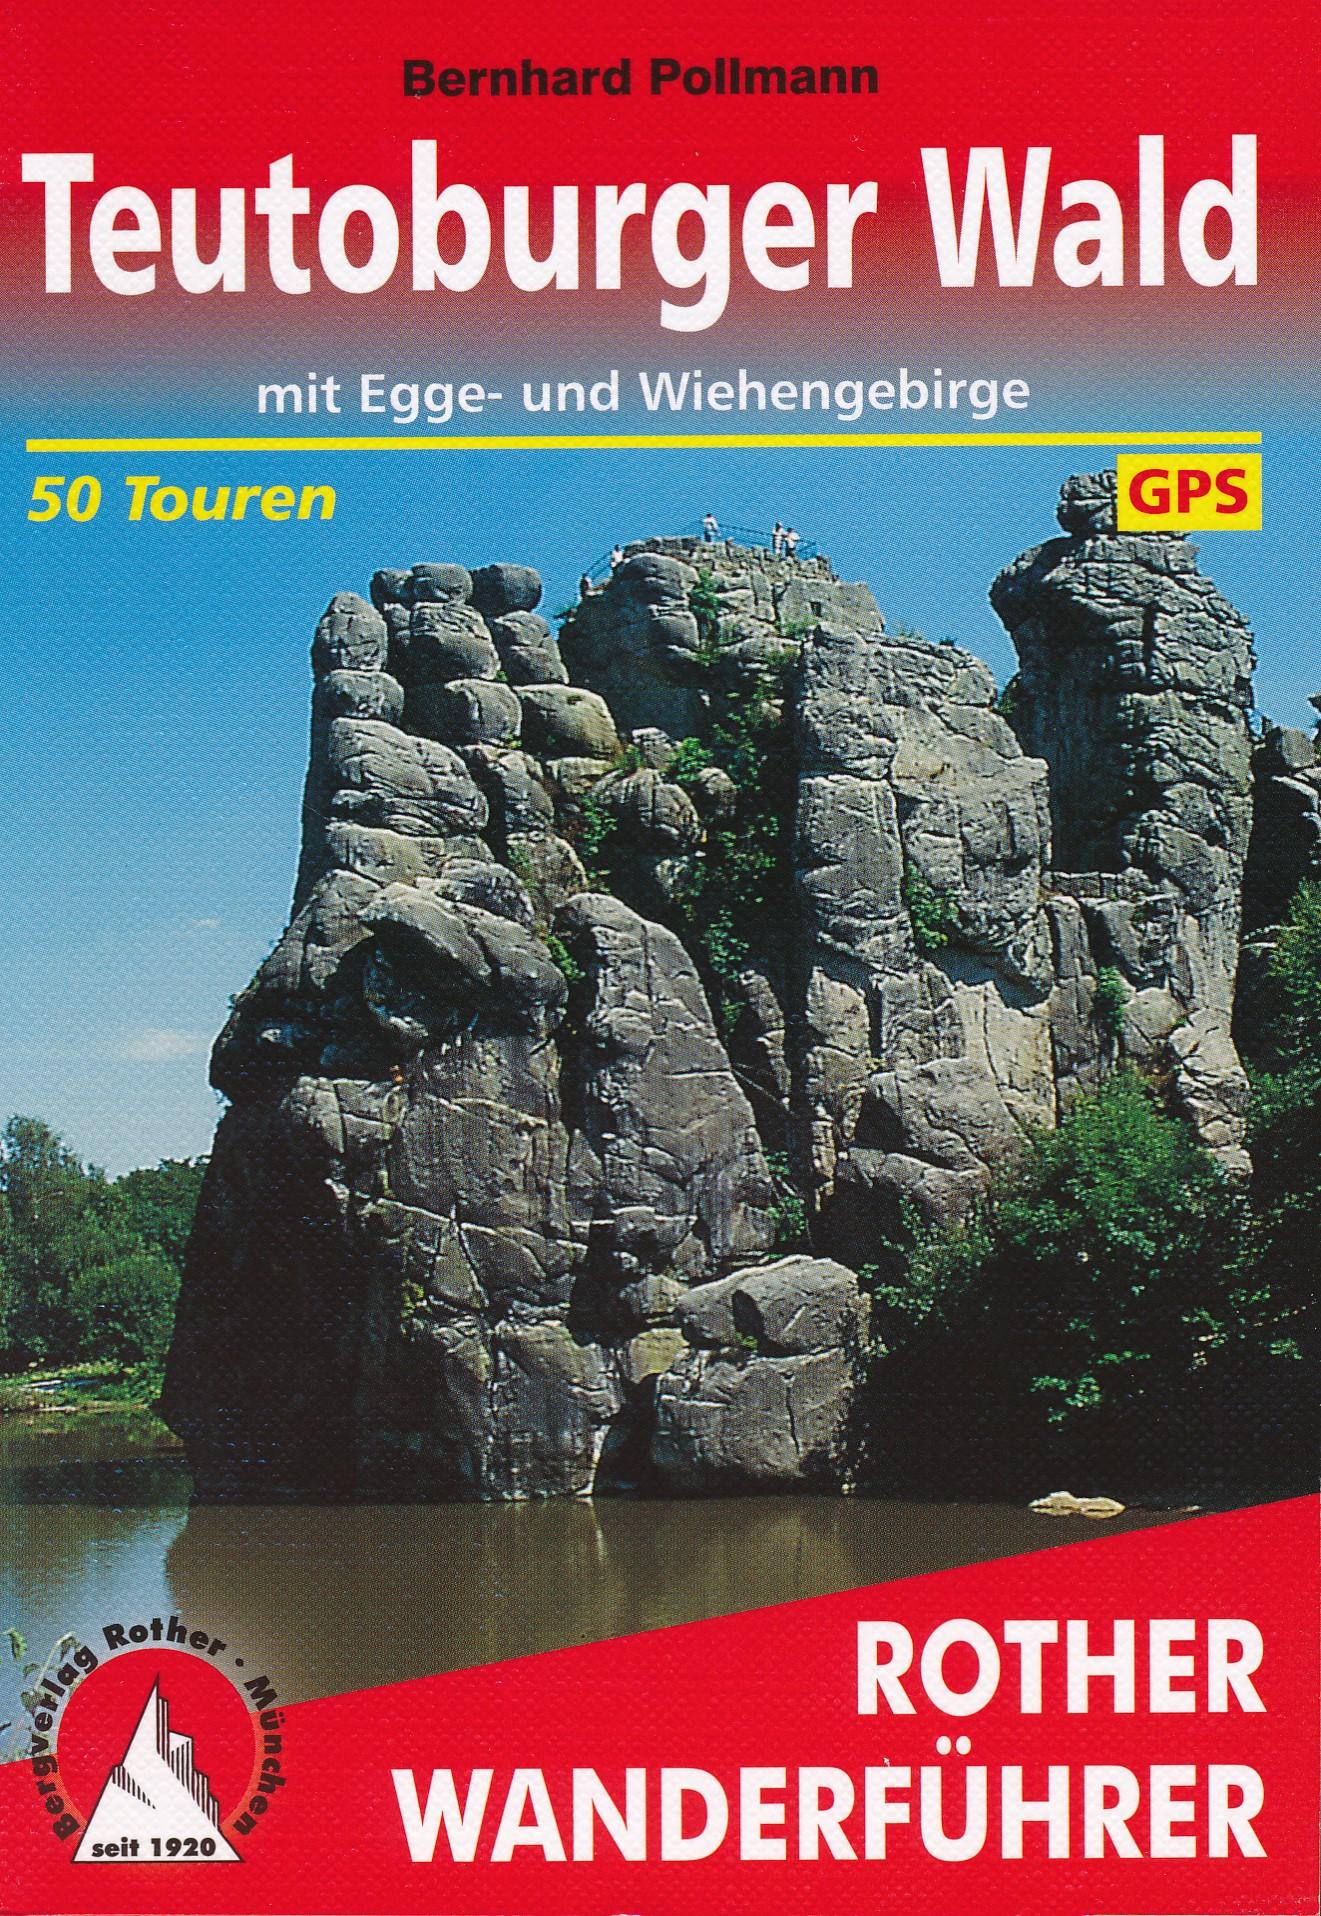 Opruiming - Wandelgids Teutoburger Wald - Teutoburgerwoud   Rother Bergverlag de zwerver